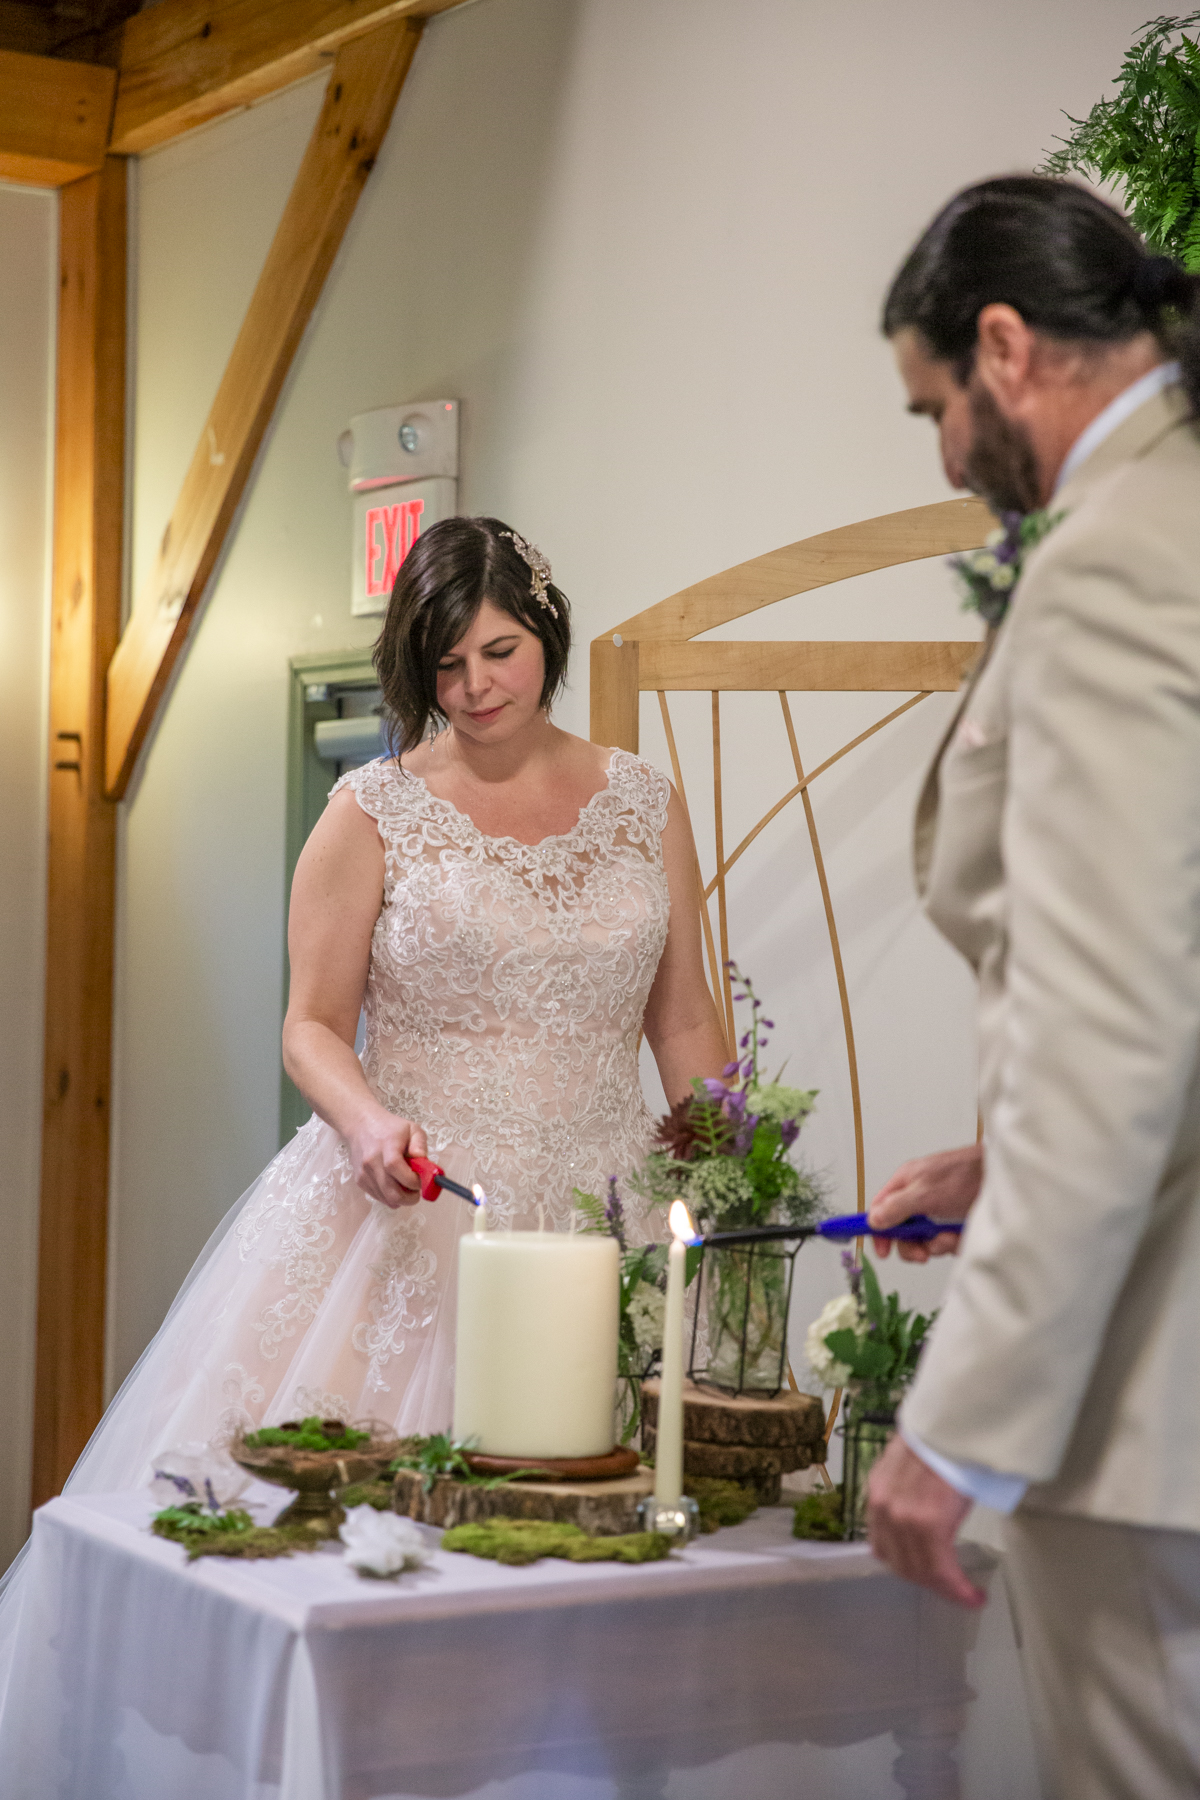 Avyanna and Phoenix Wedding- Photos by Studio Misha_BLOG-130.jpg